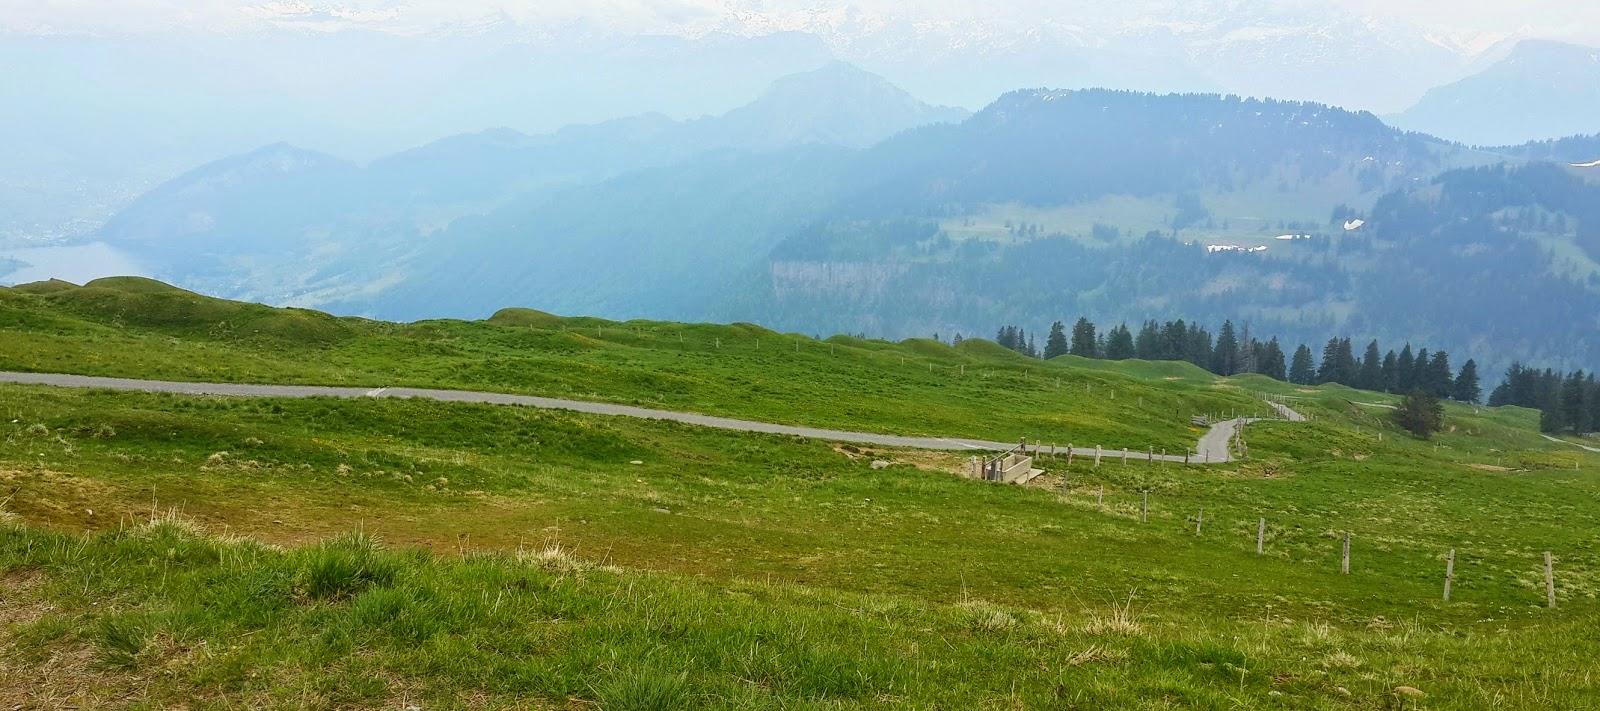 breathtaking views of Swiss Alps from Mt.Rigi